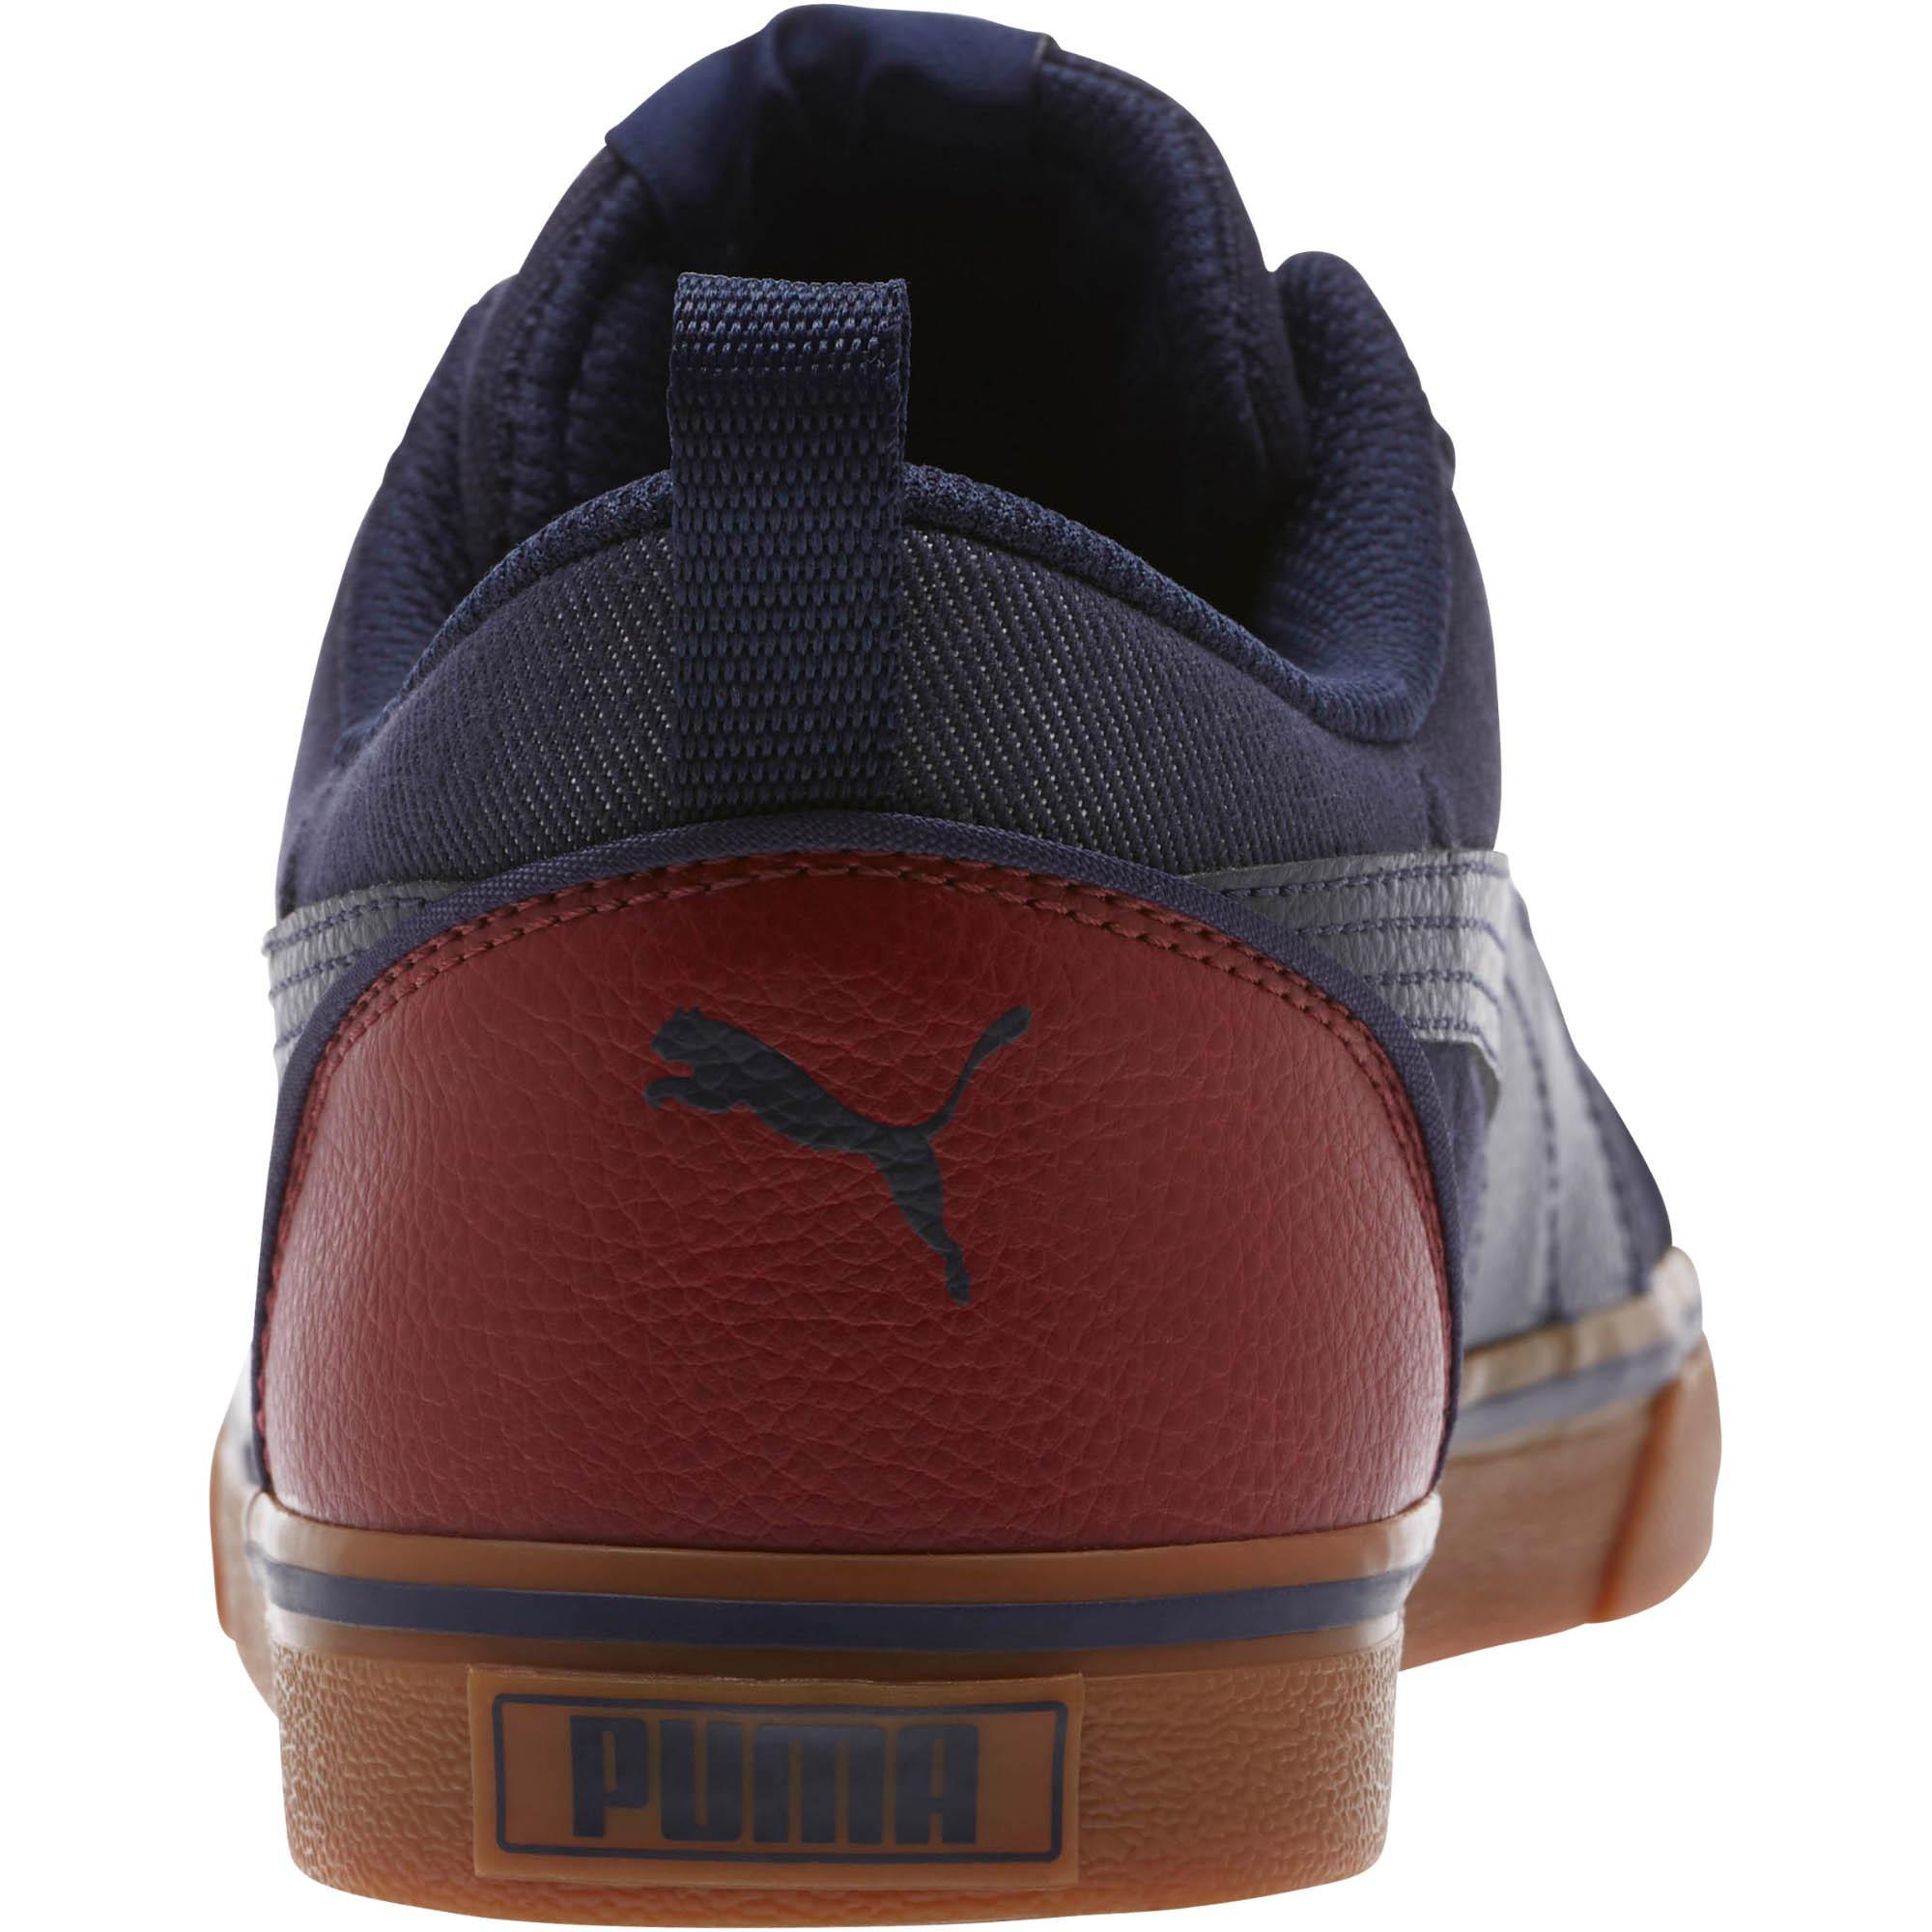 1135954db5f PUMA - Blue Bridger Men s Sneakers for Men - Lyst. View fullscreen